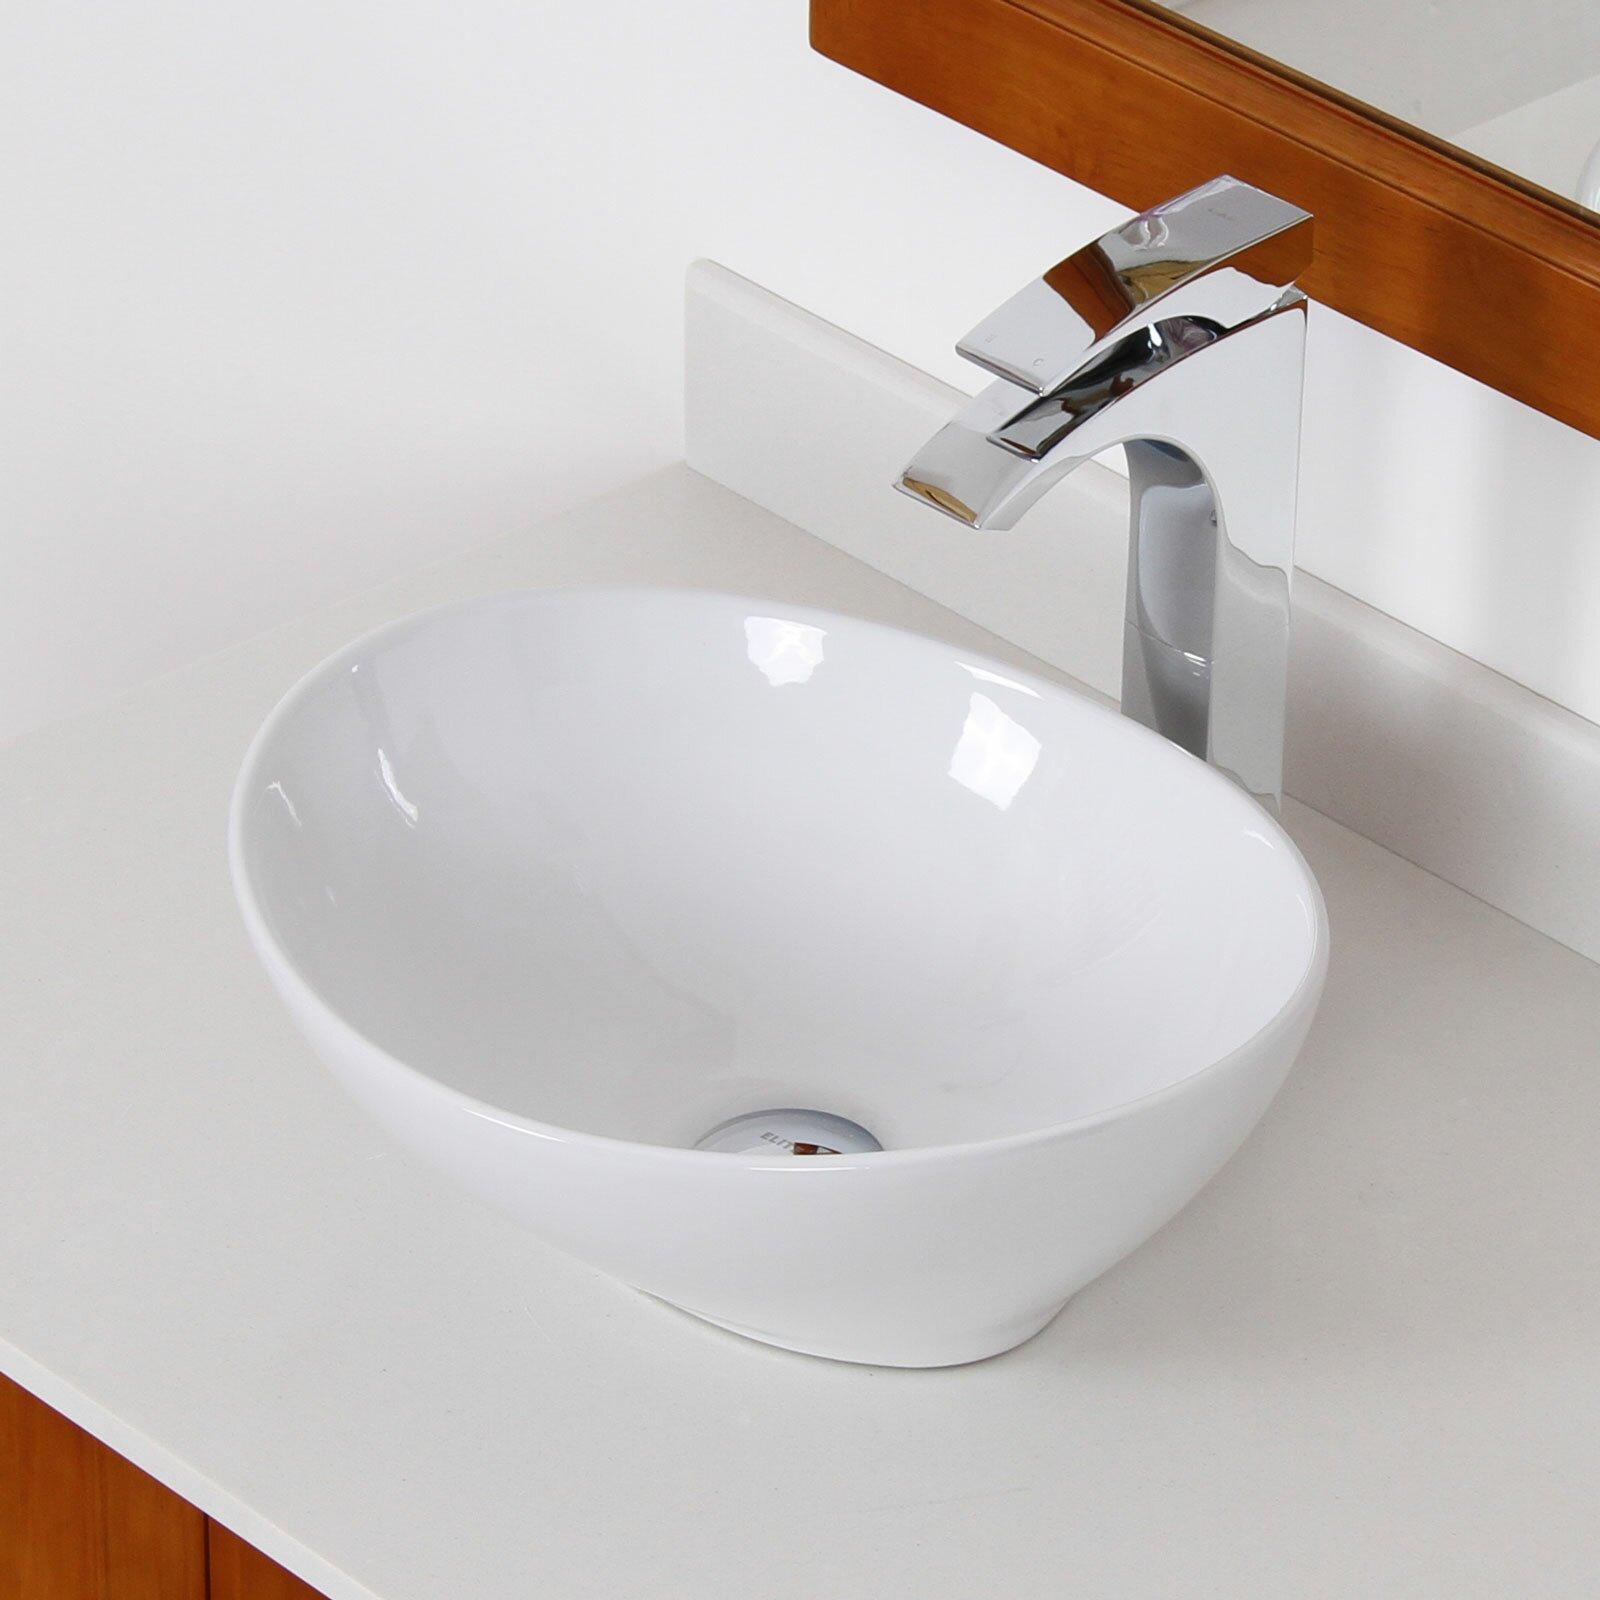 Elite ceramic boat shaped bathroom sink reviews wayfair for Boat ornaments for bathroom